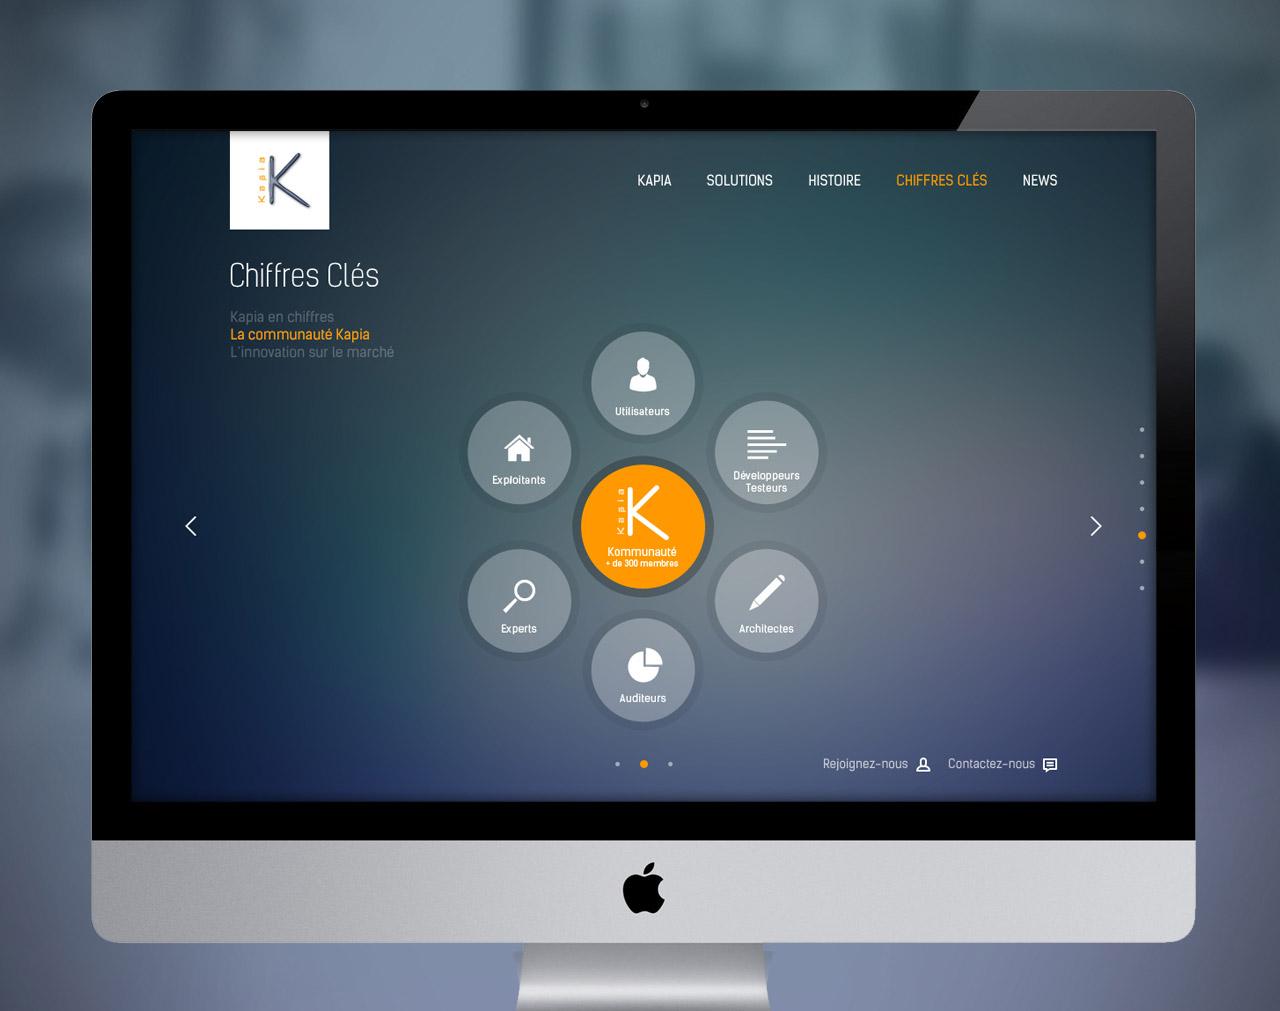 kapia-solutions-chiffres-2-site-internet-responsive-design-creation-communication-caconcept-alexis-cretin-graphiste